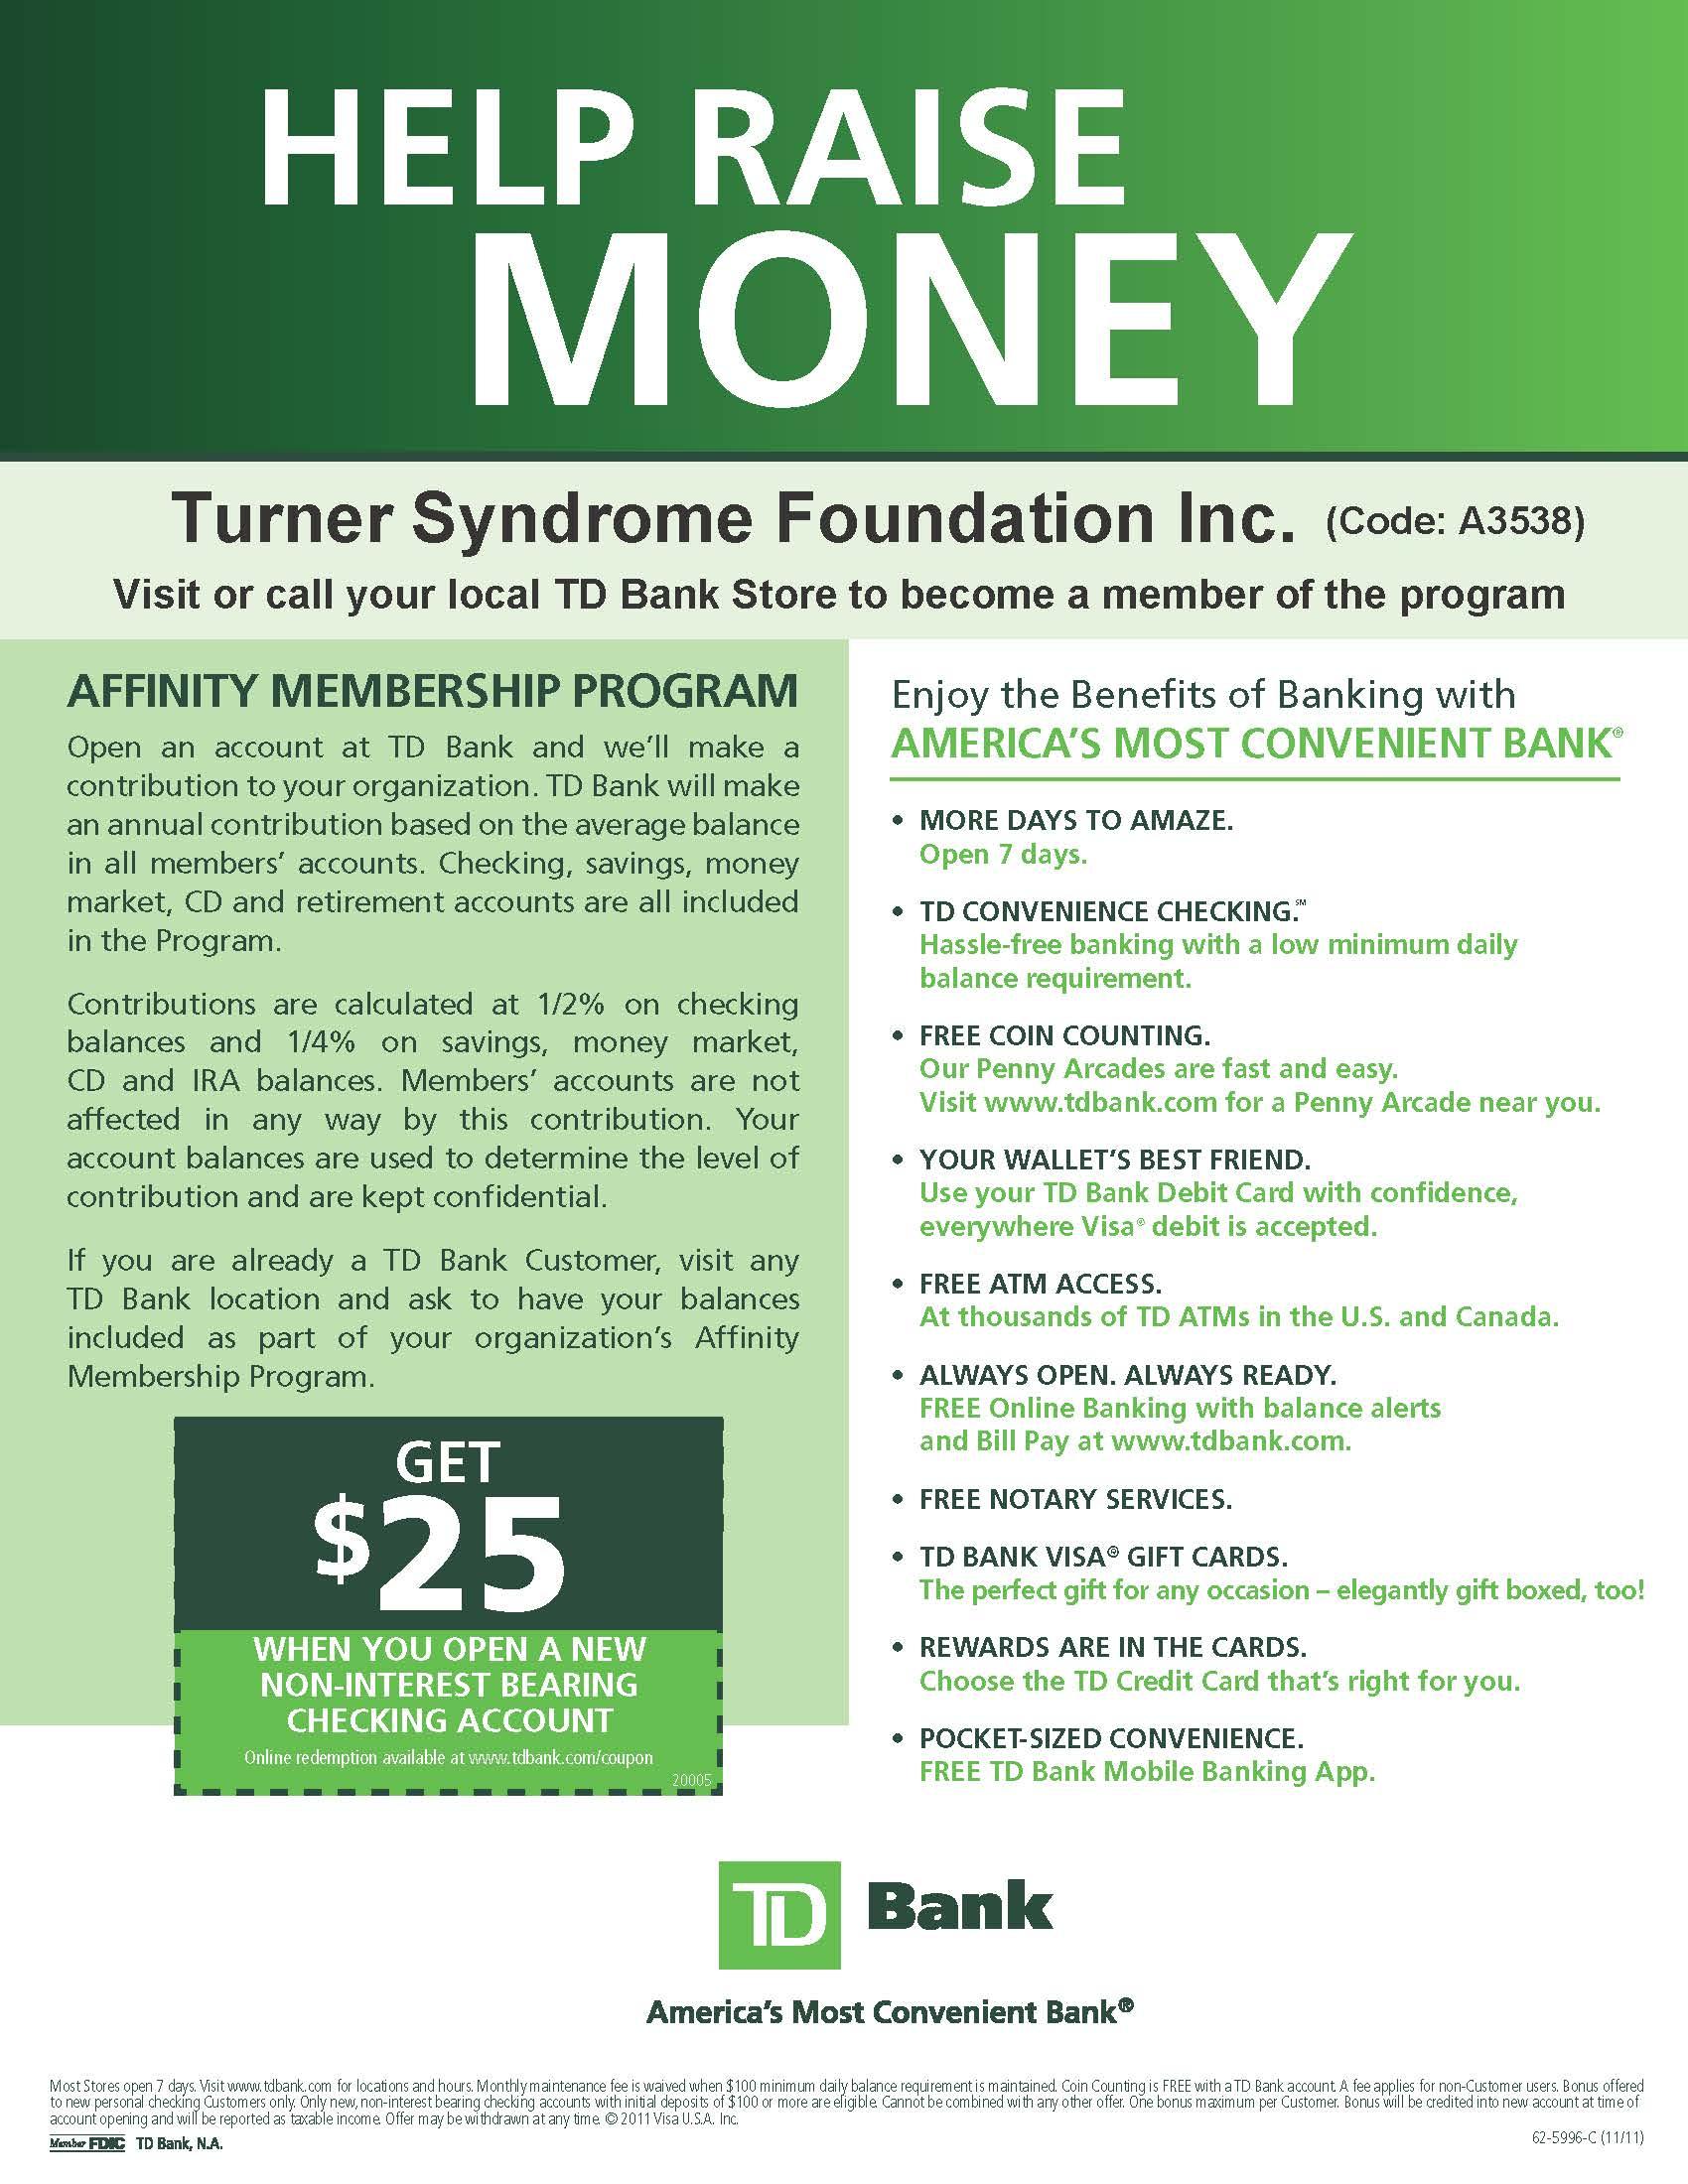 Td affinity flyer 04 19 12 turner syndrome foundation td affinity flyer 04 19 12 m4hsunfo